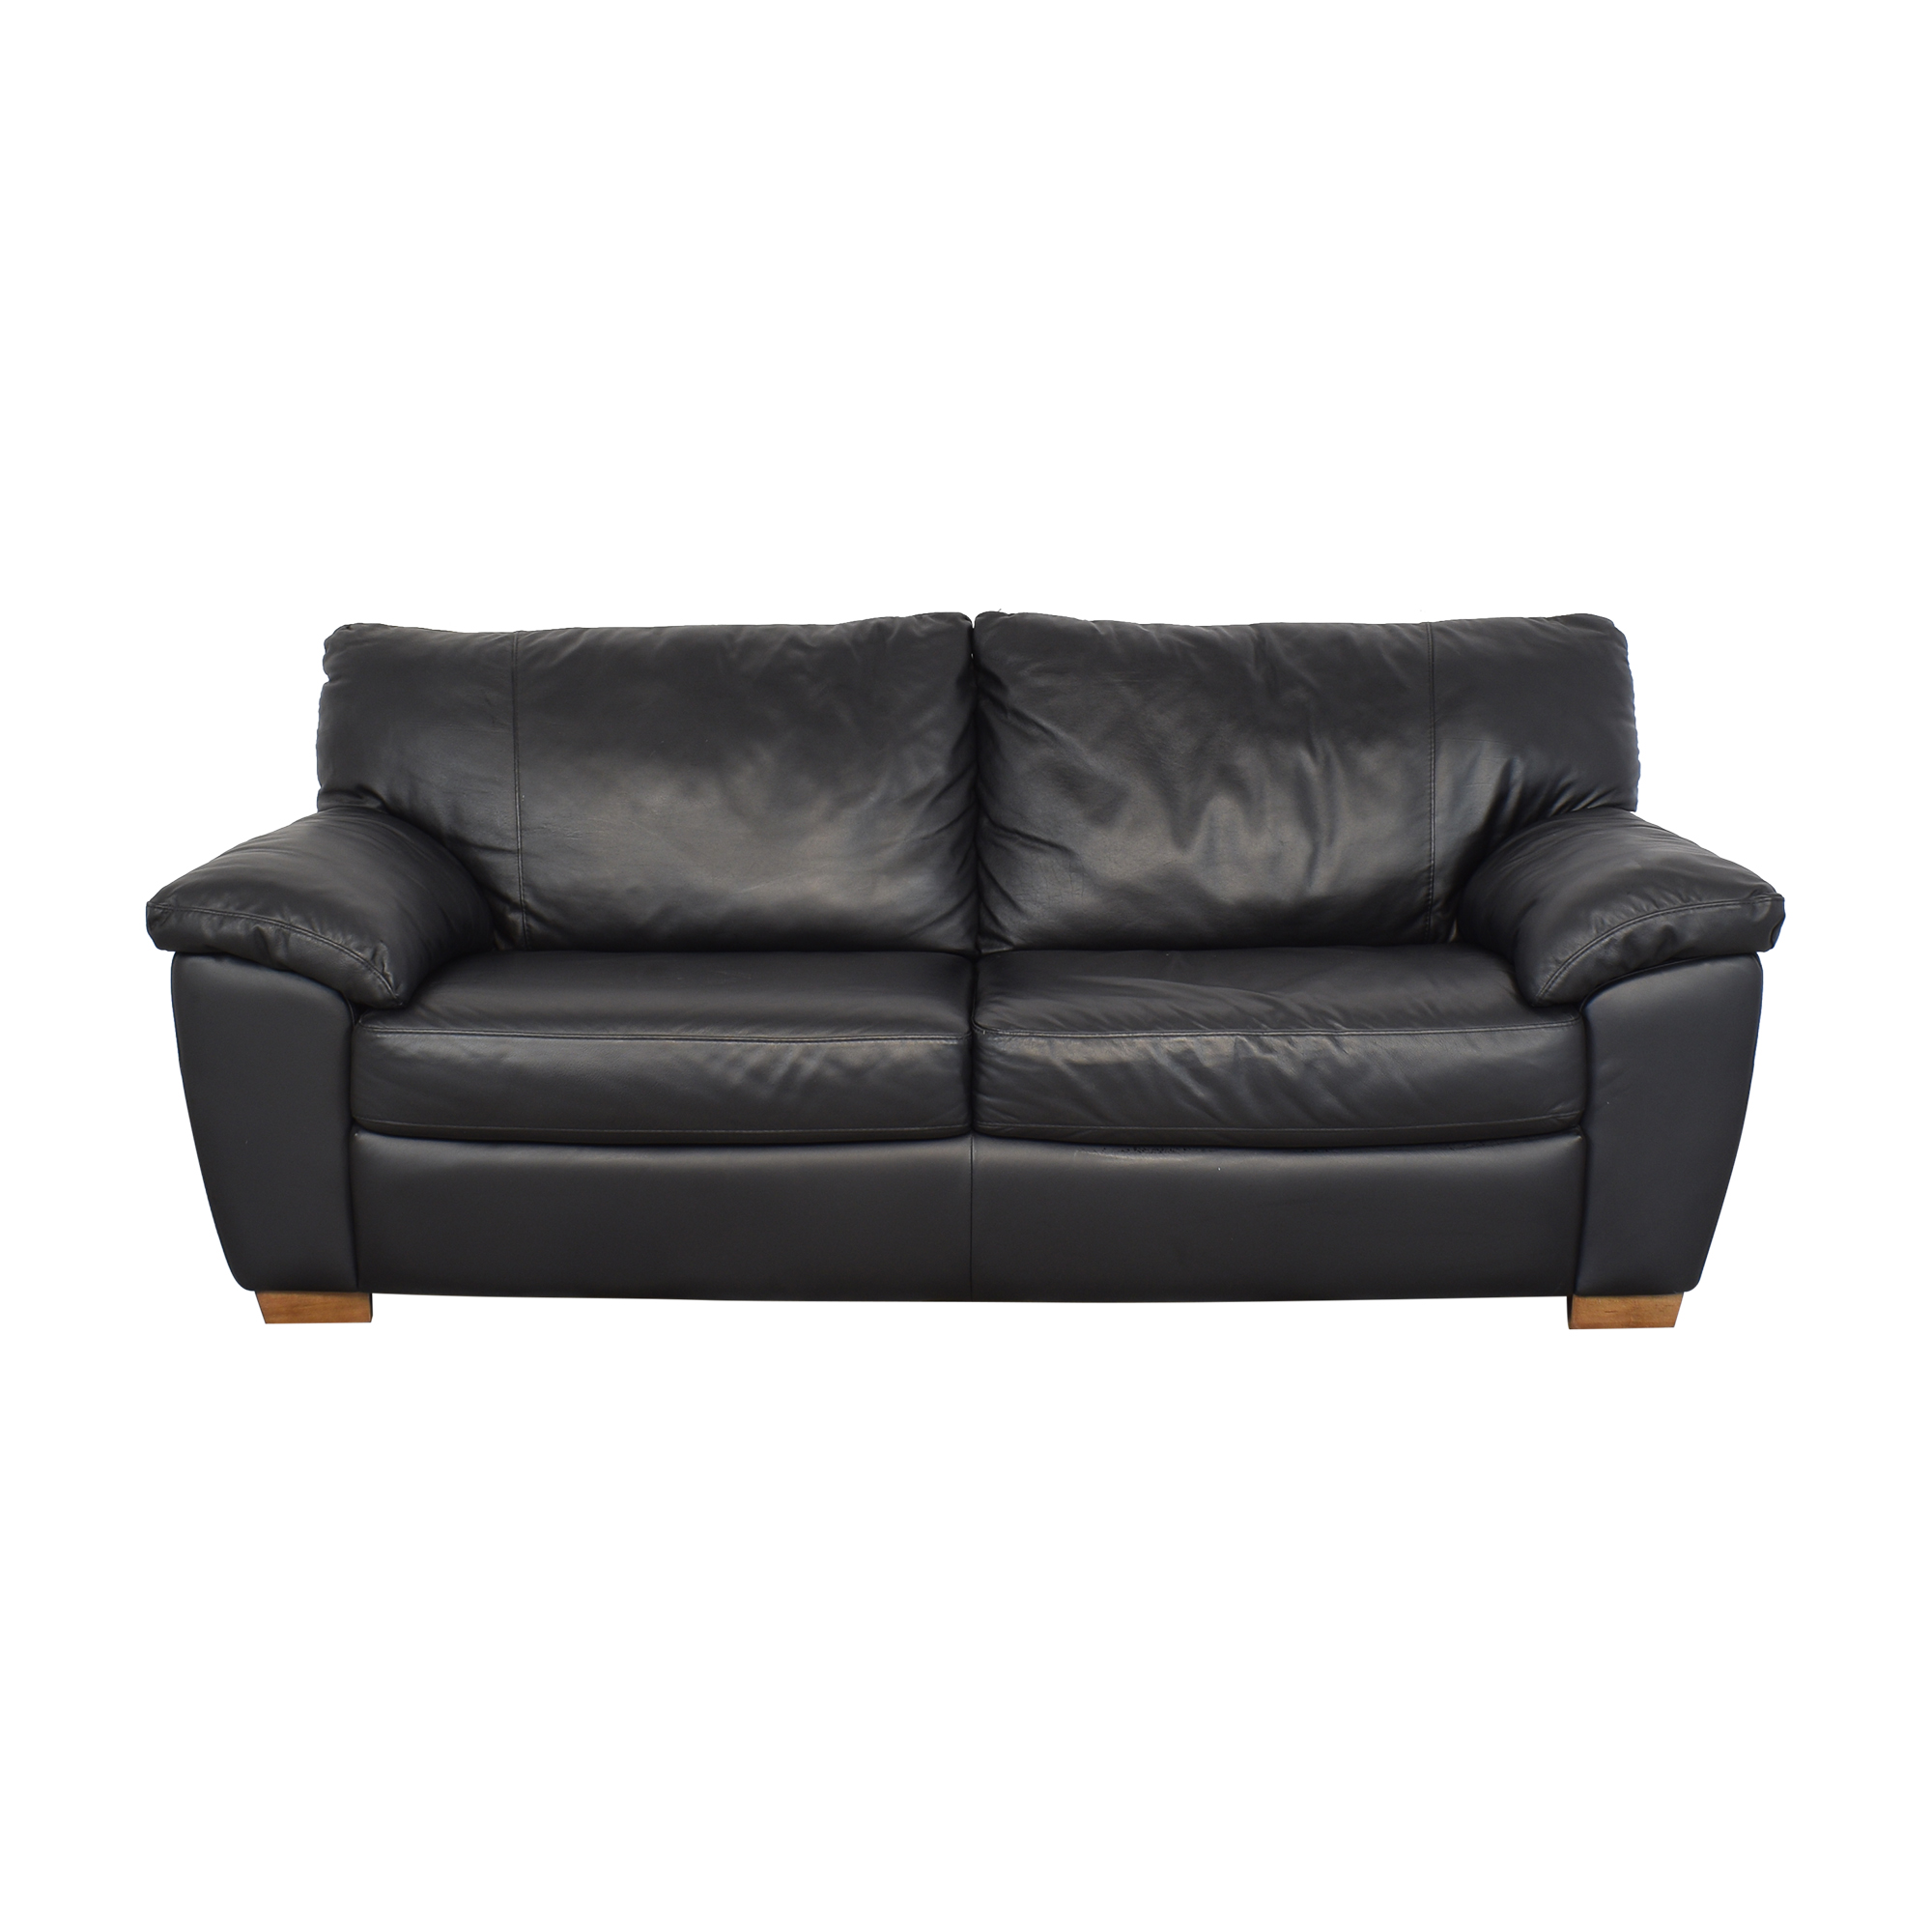 IKEA IKEA Vreta Sofa Classic Sofas